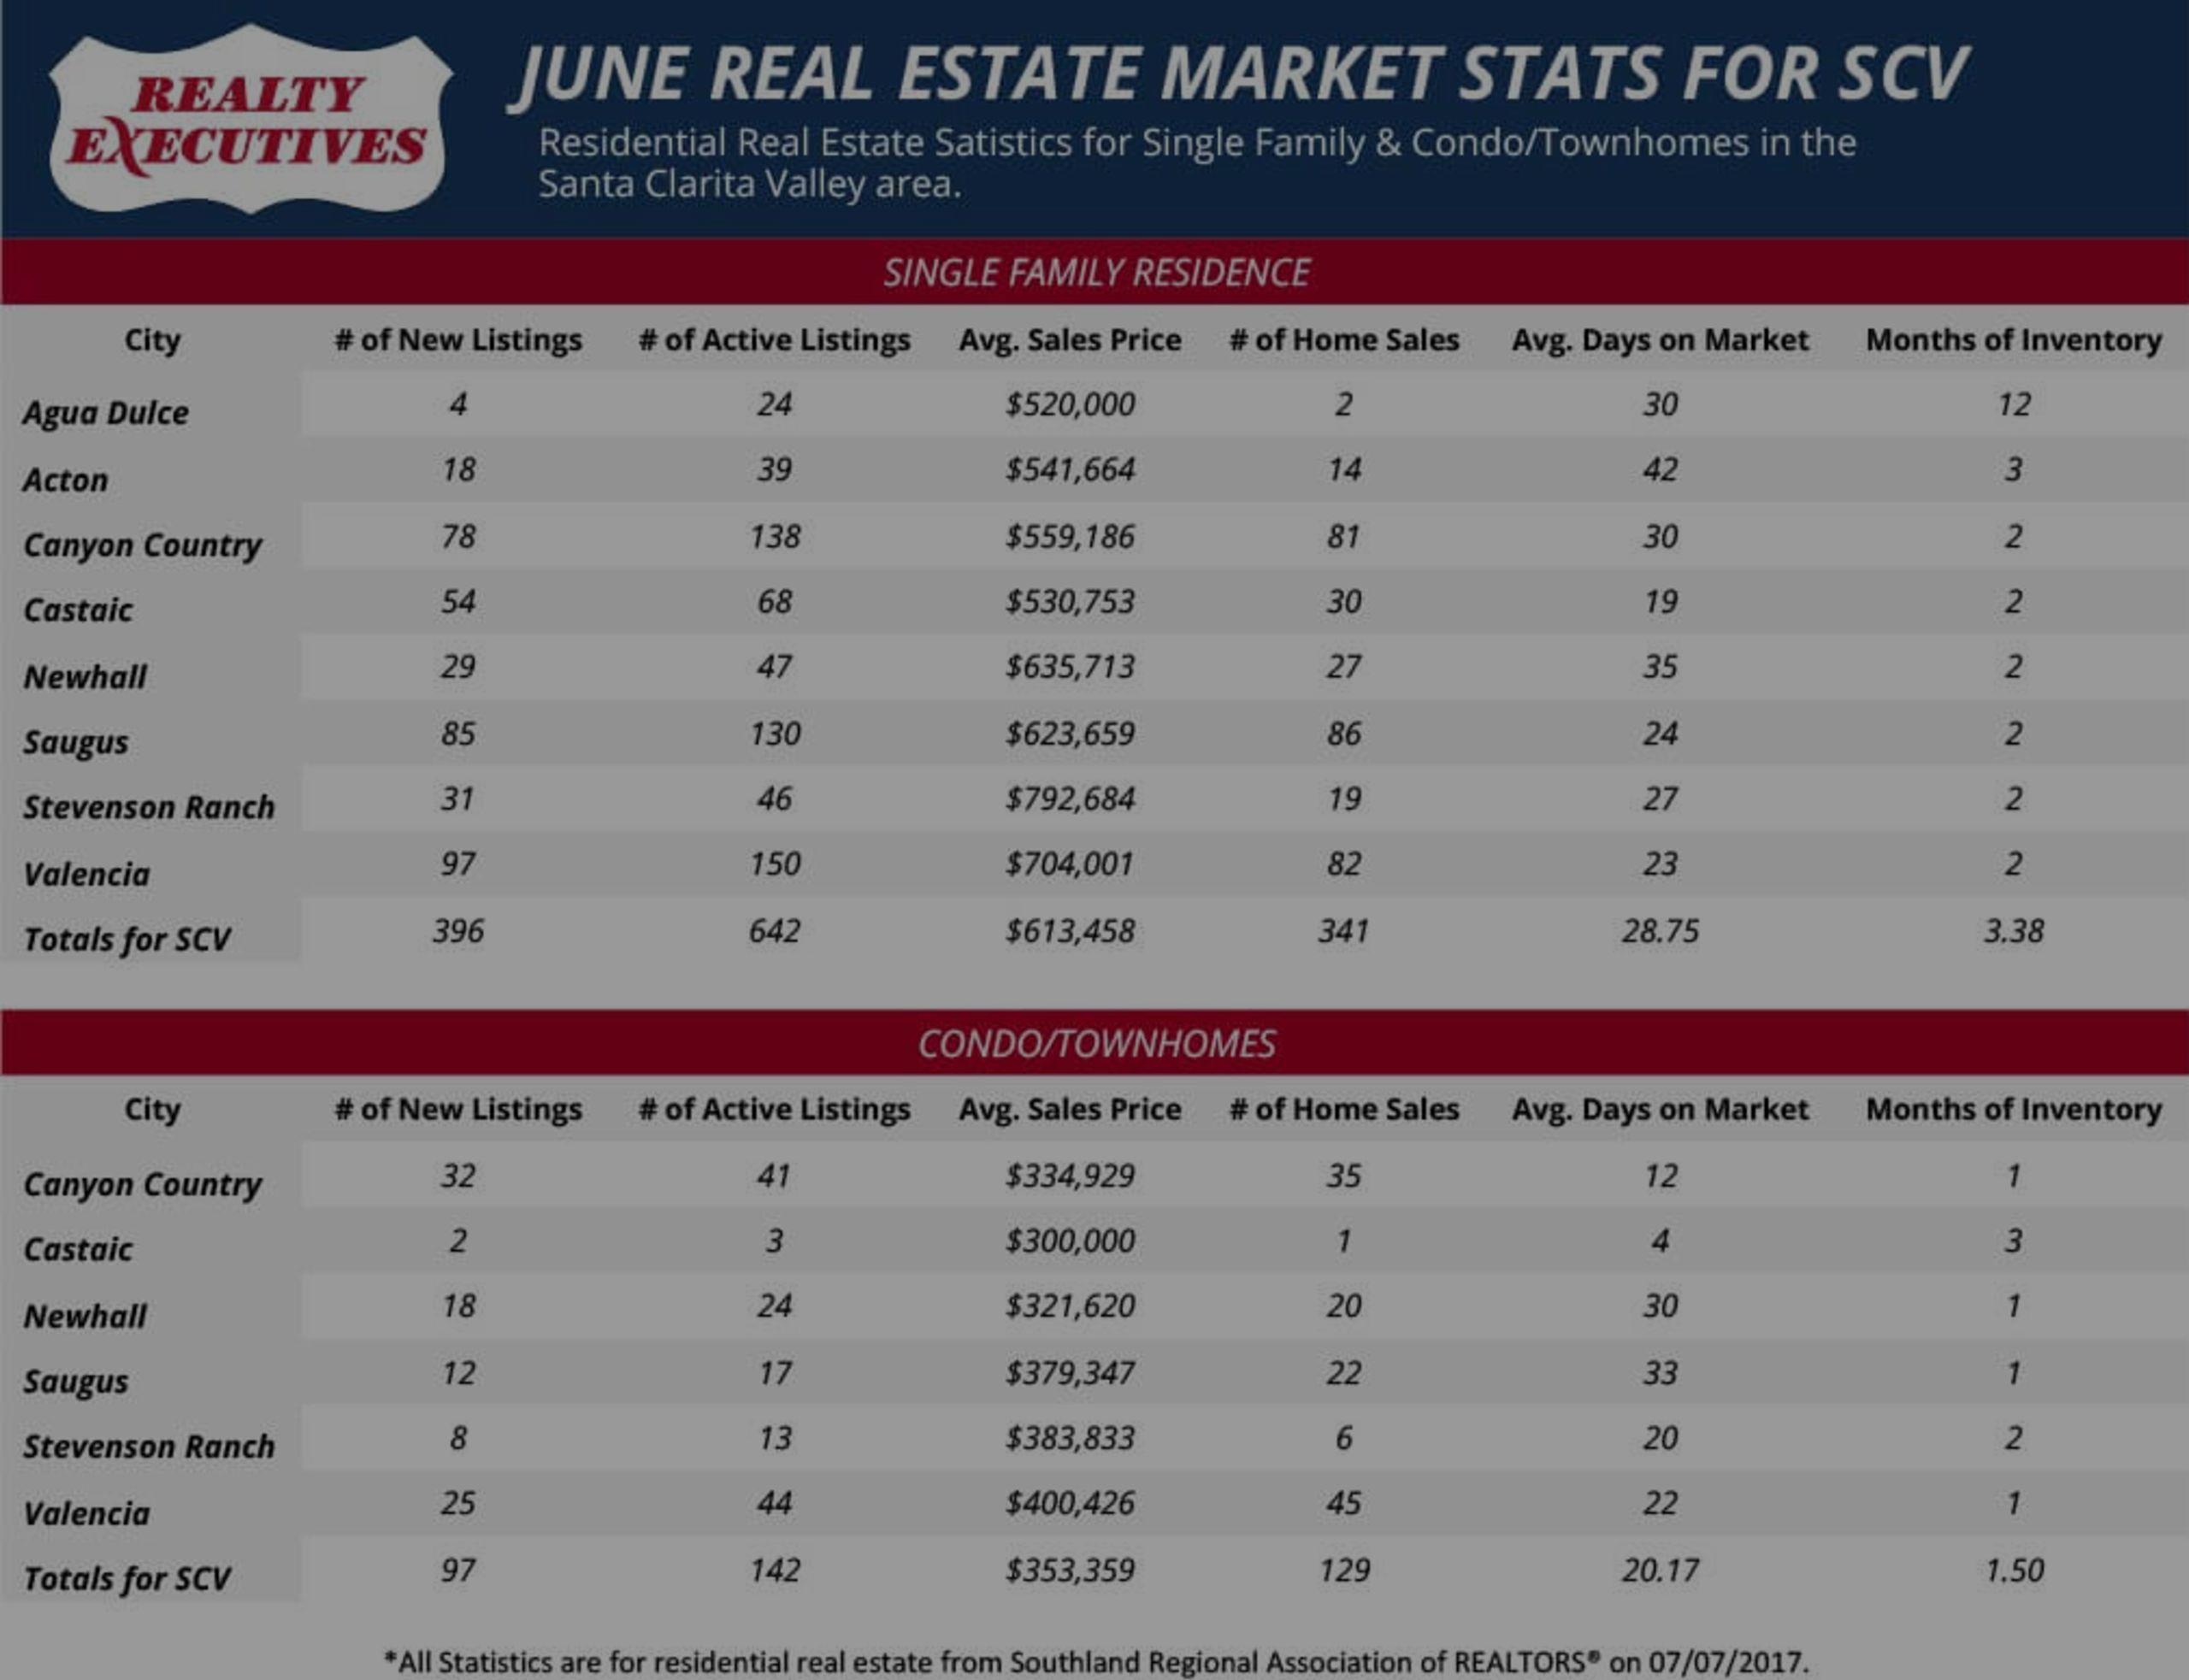 June 2017: Santa Clarita Real Estate Market Statistics